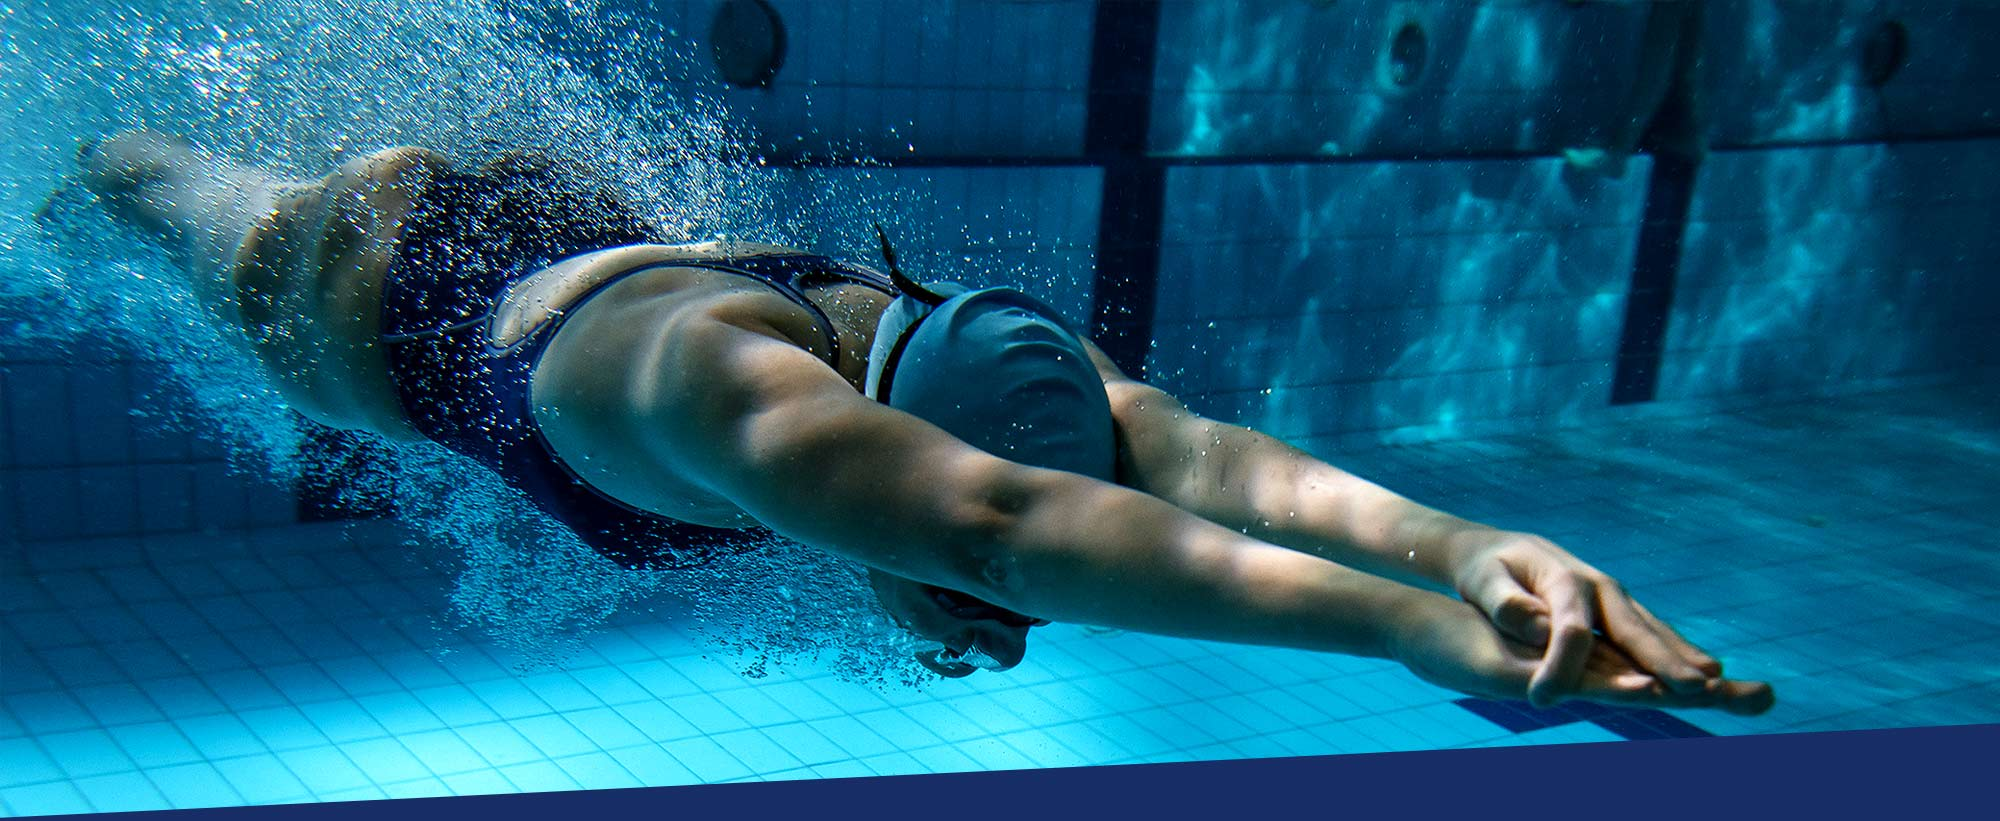 AquaAdults, Aquasport, Aquasport-System, Erwachsene, Schwimmen